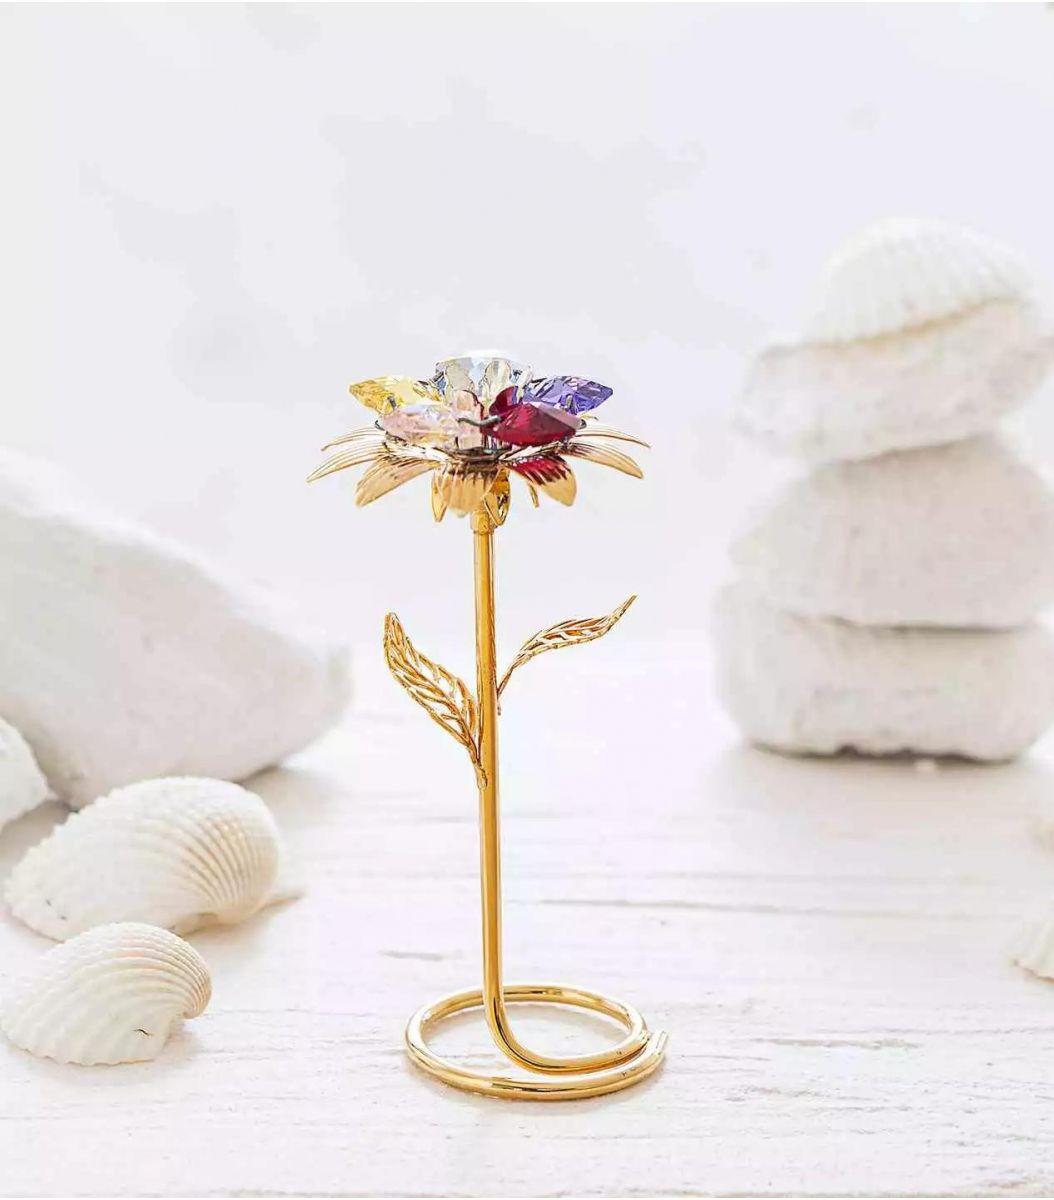 Gift Items SWO2629